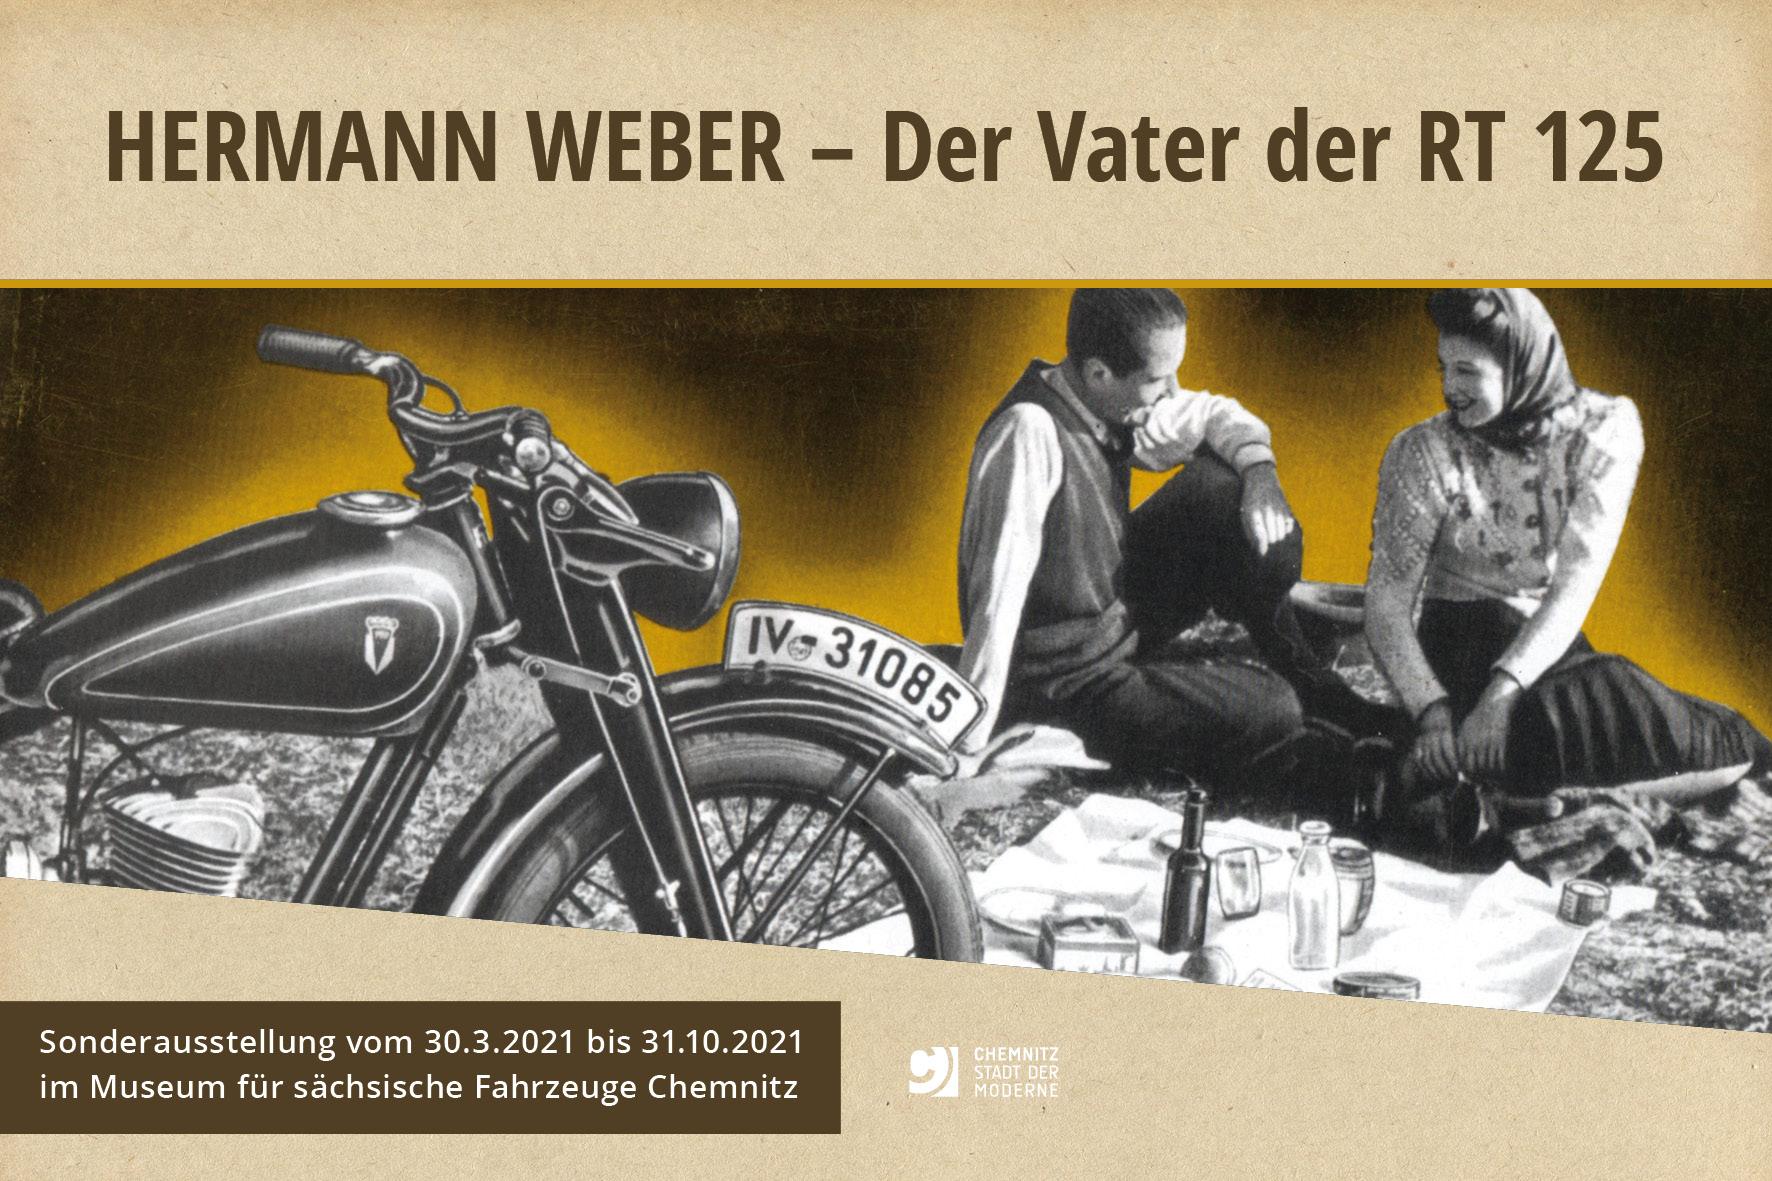 Hermann Weber - Der Vater der RT